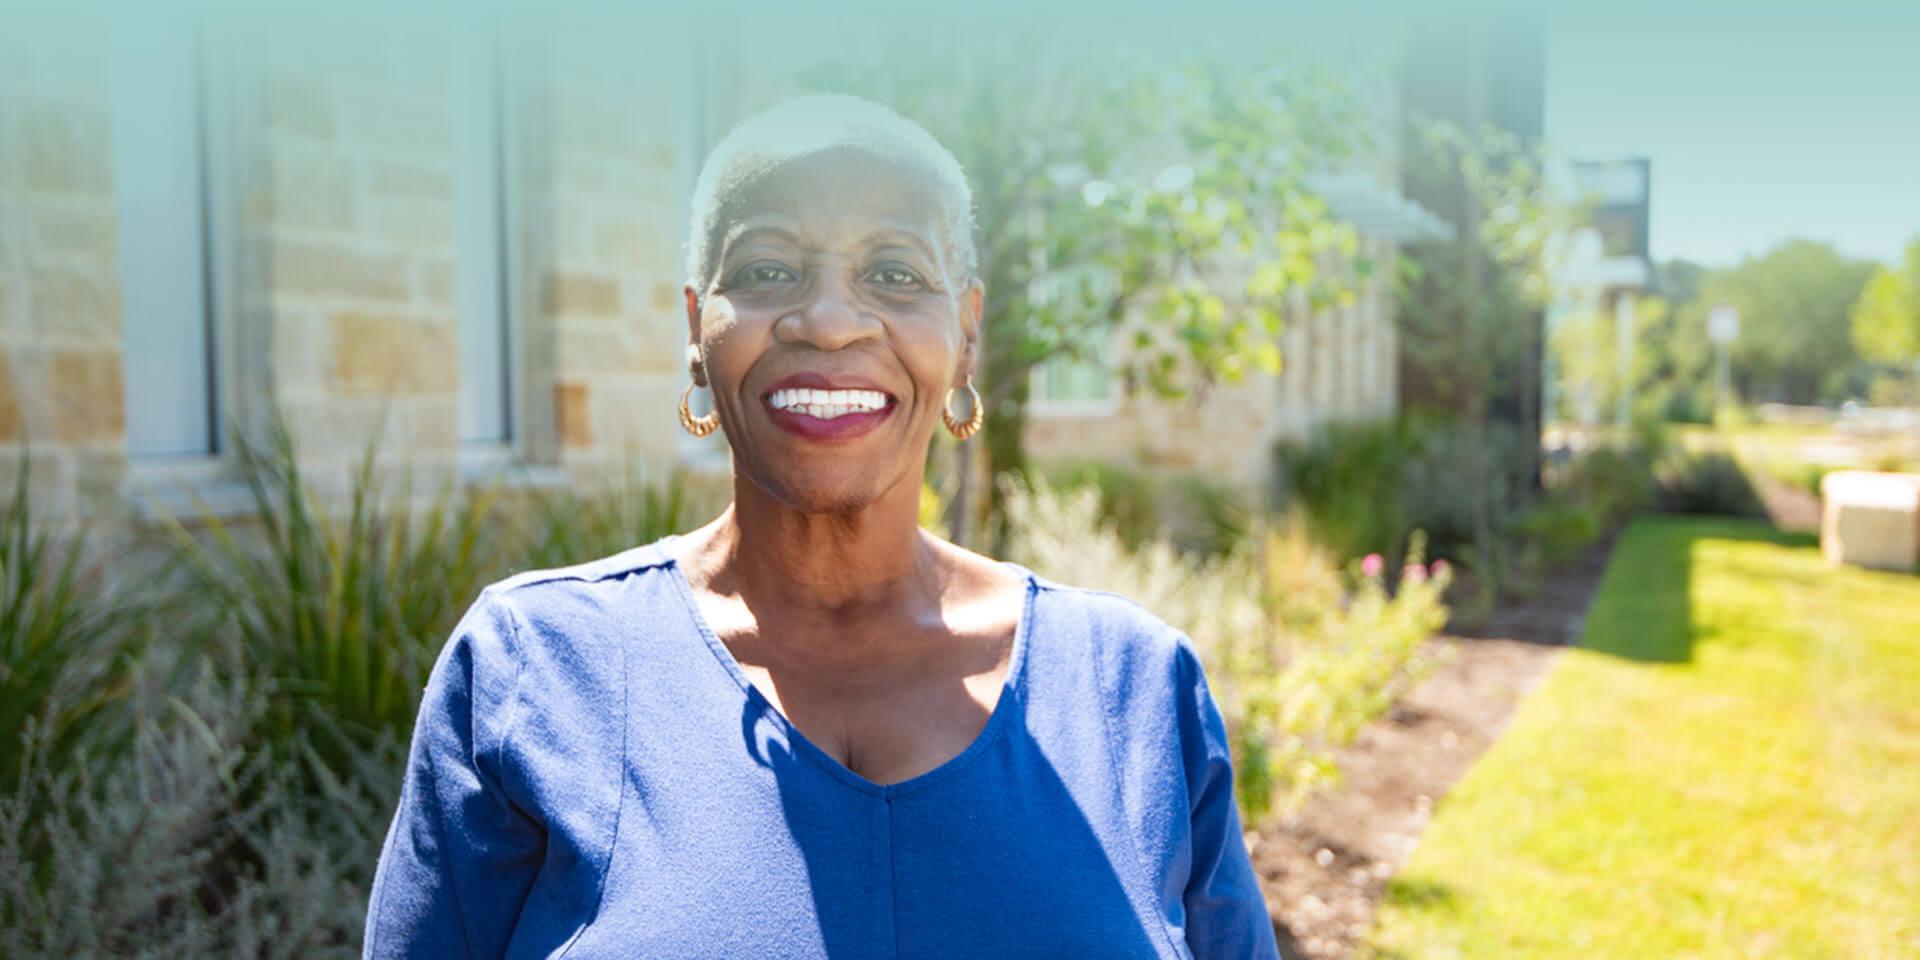 Elderly woman smiling showing white teeth